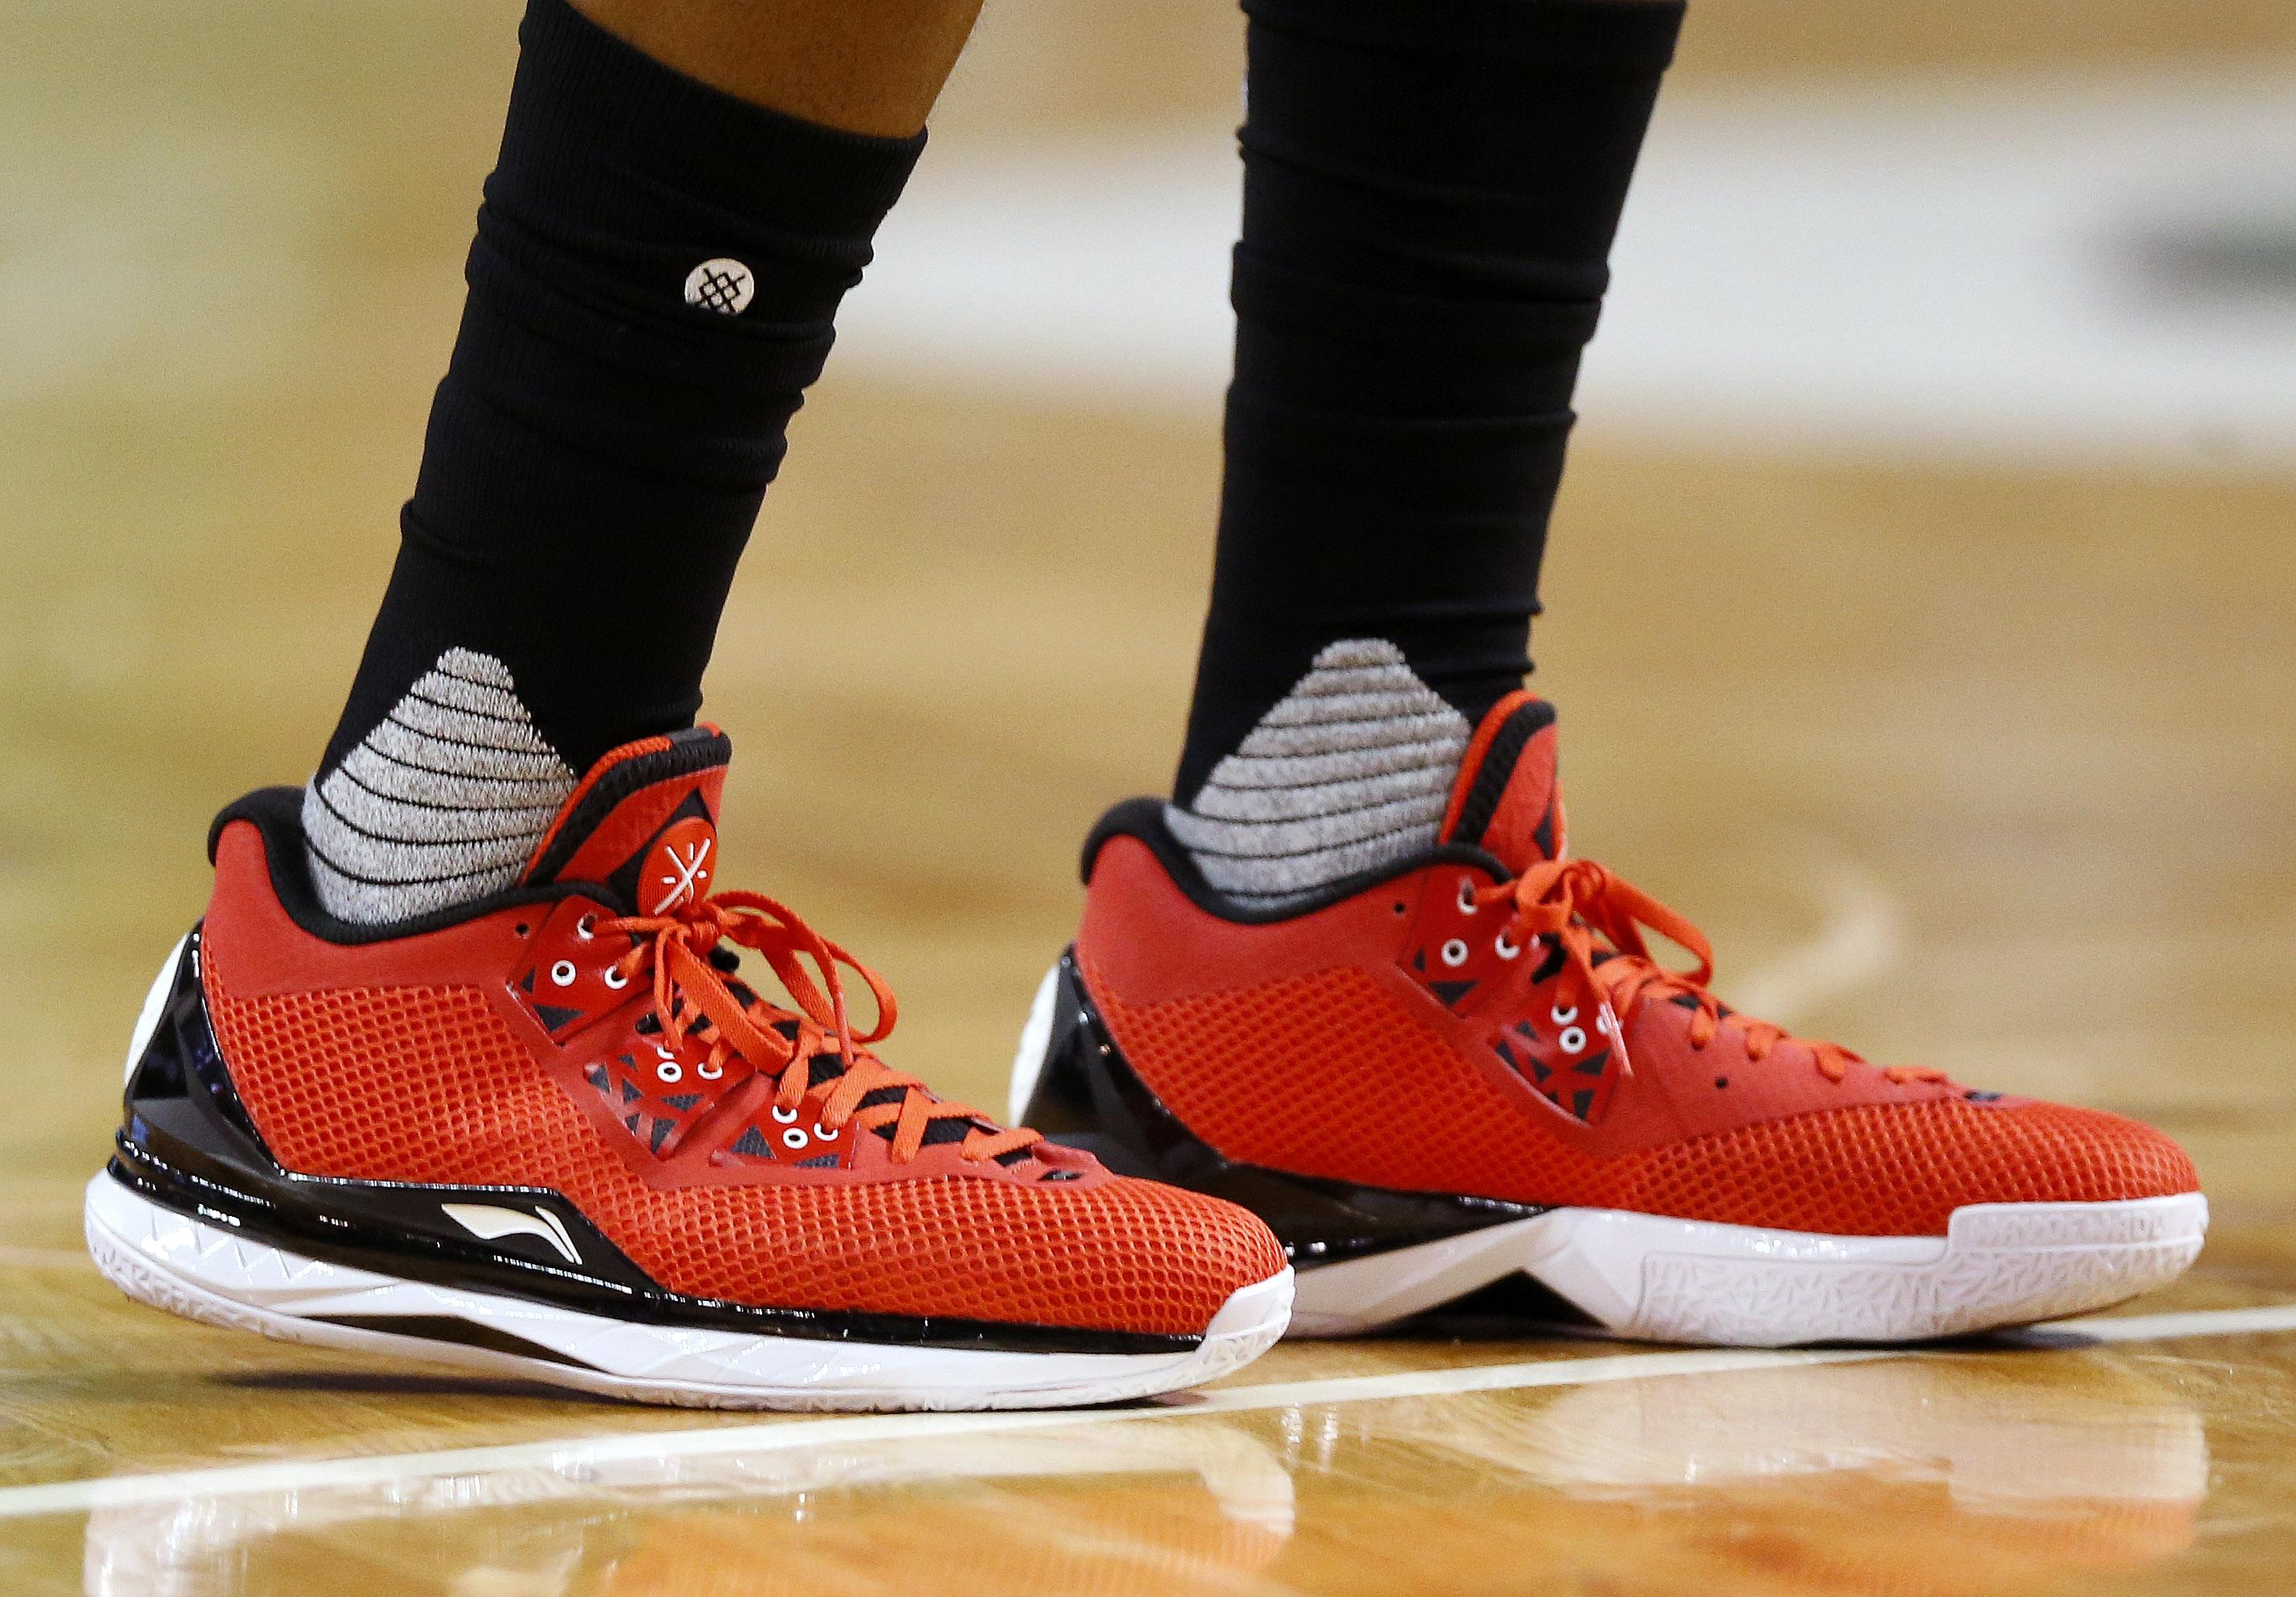 Photo of the Li Ning shoes of Miami Heat's Dwyane Wade